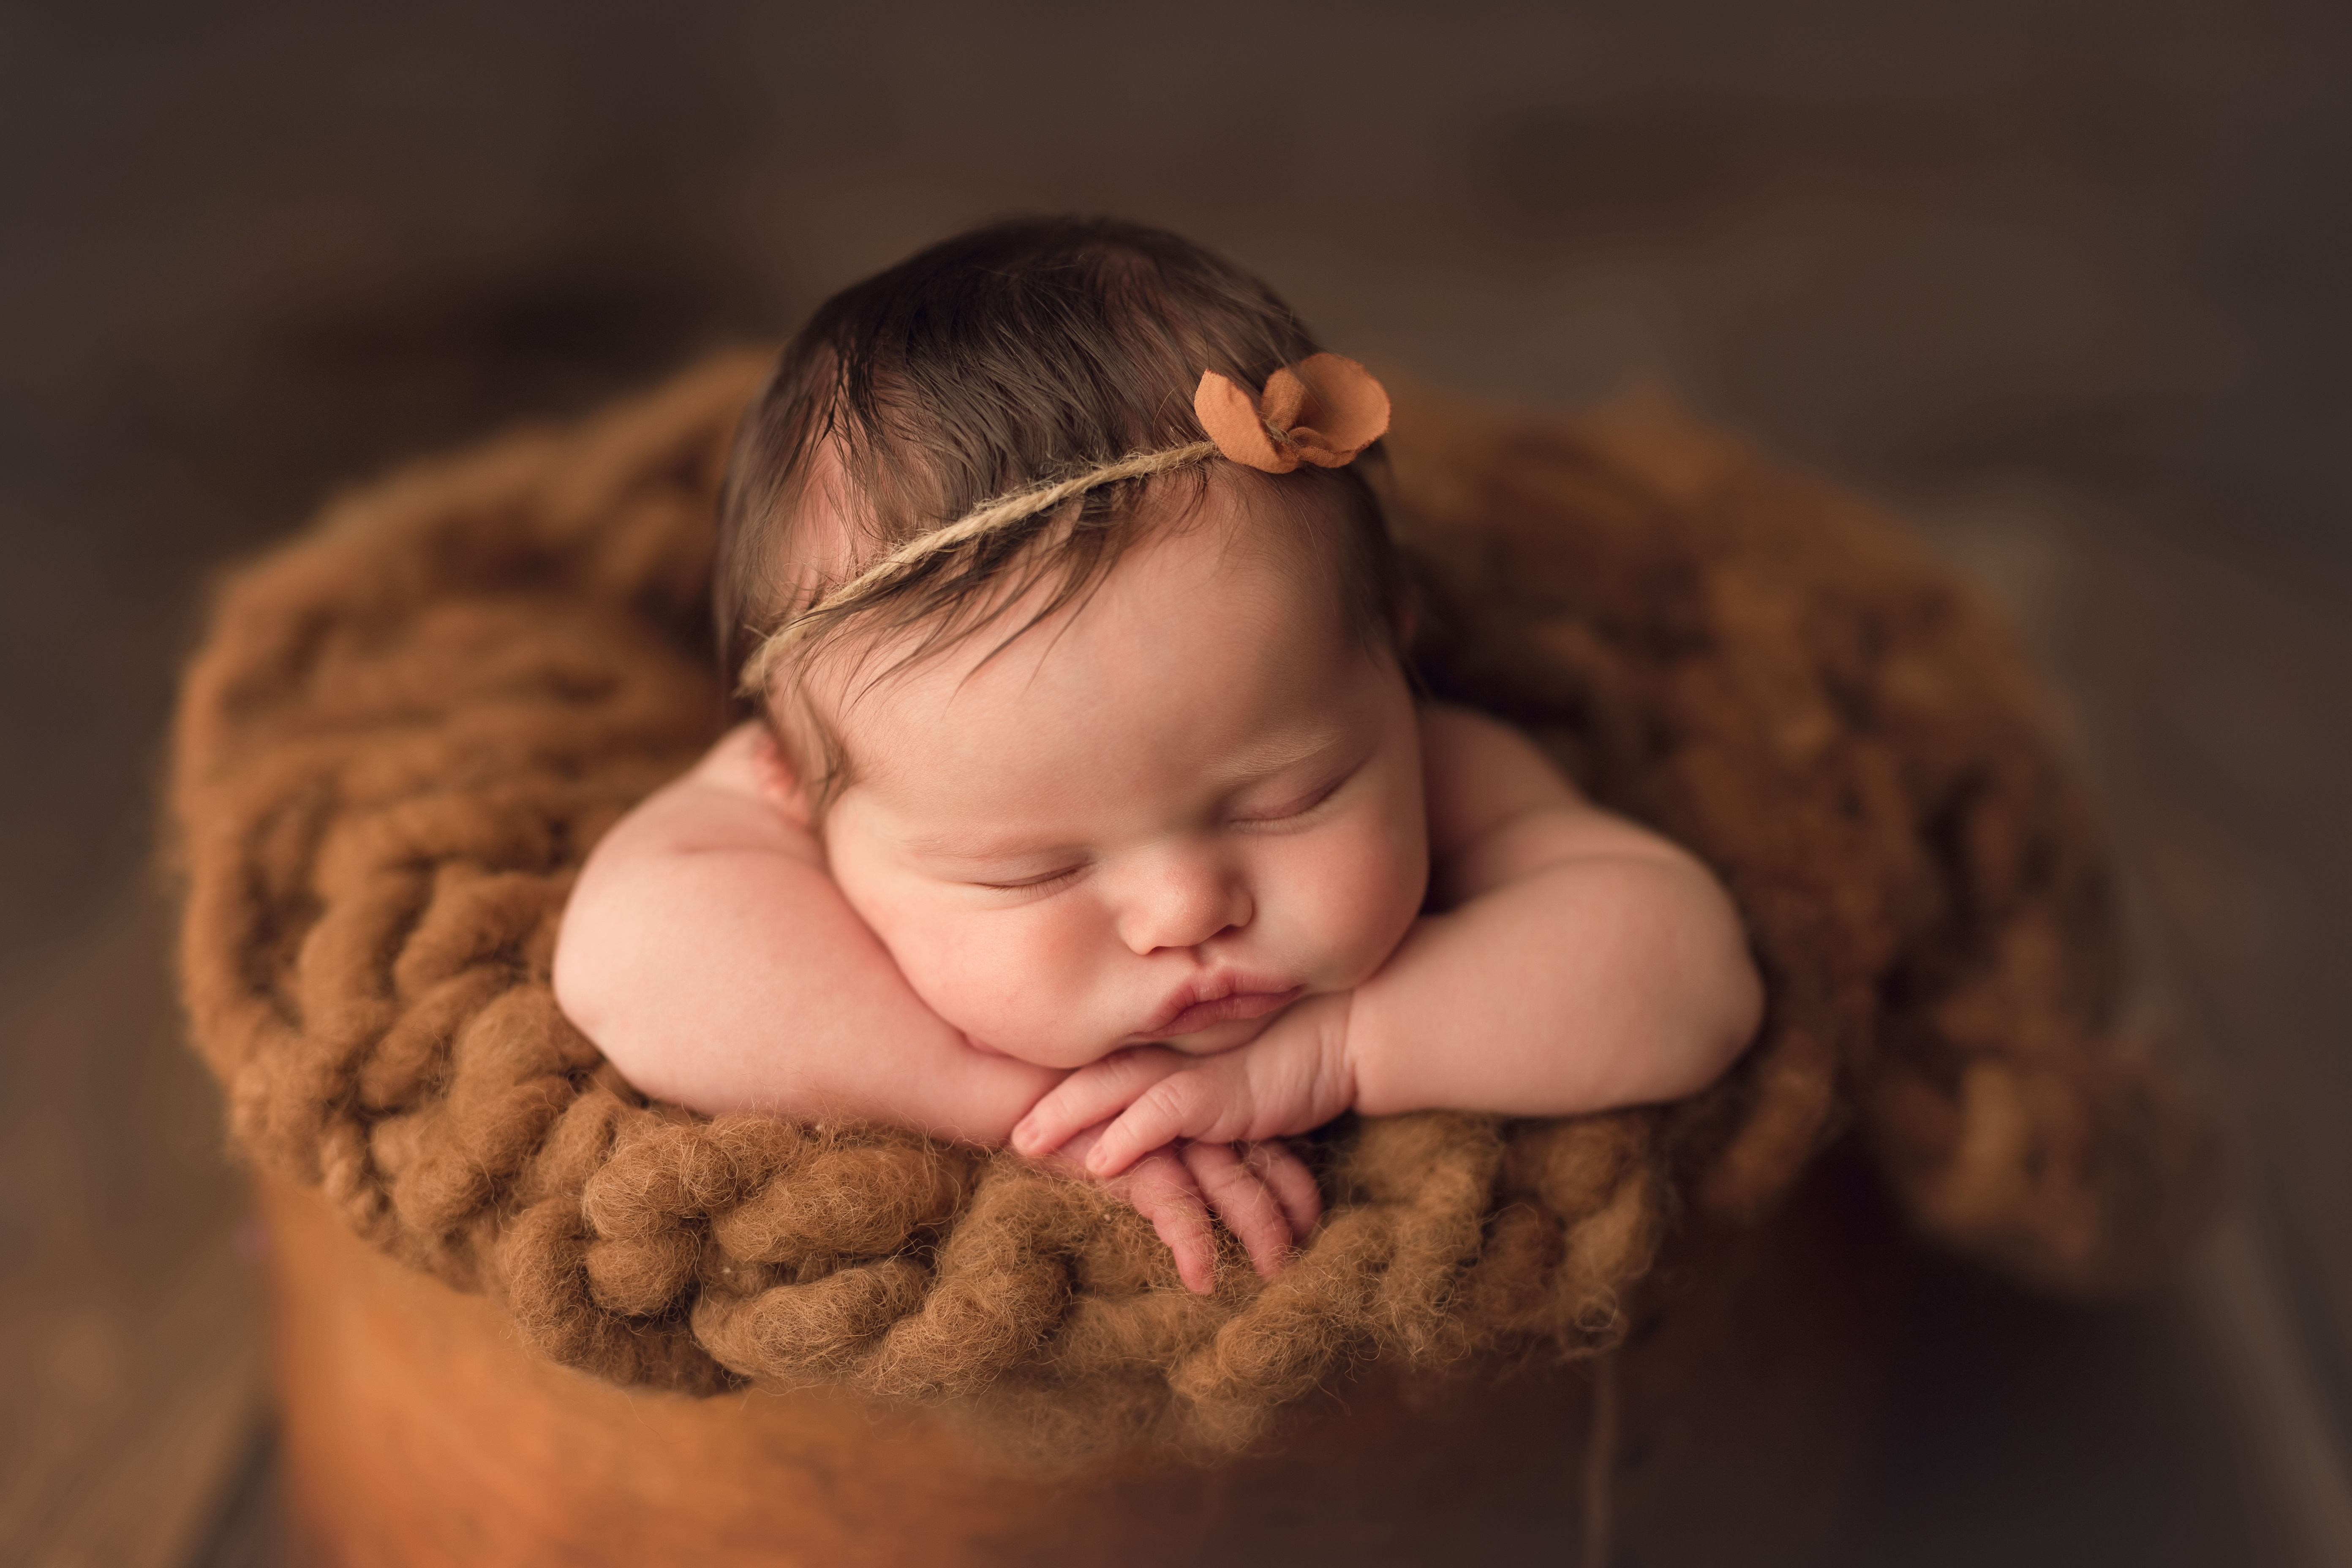 Rachel vanoven international newborn photographer and family photographer specializing in newborn posing family photography education workshops mentoring